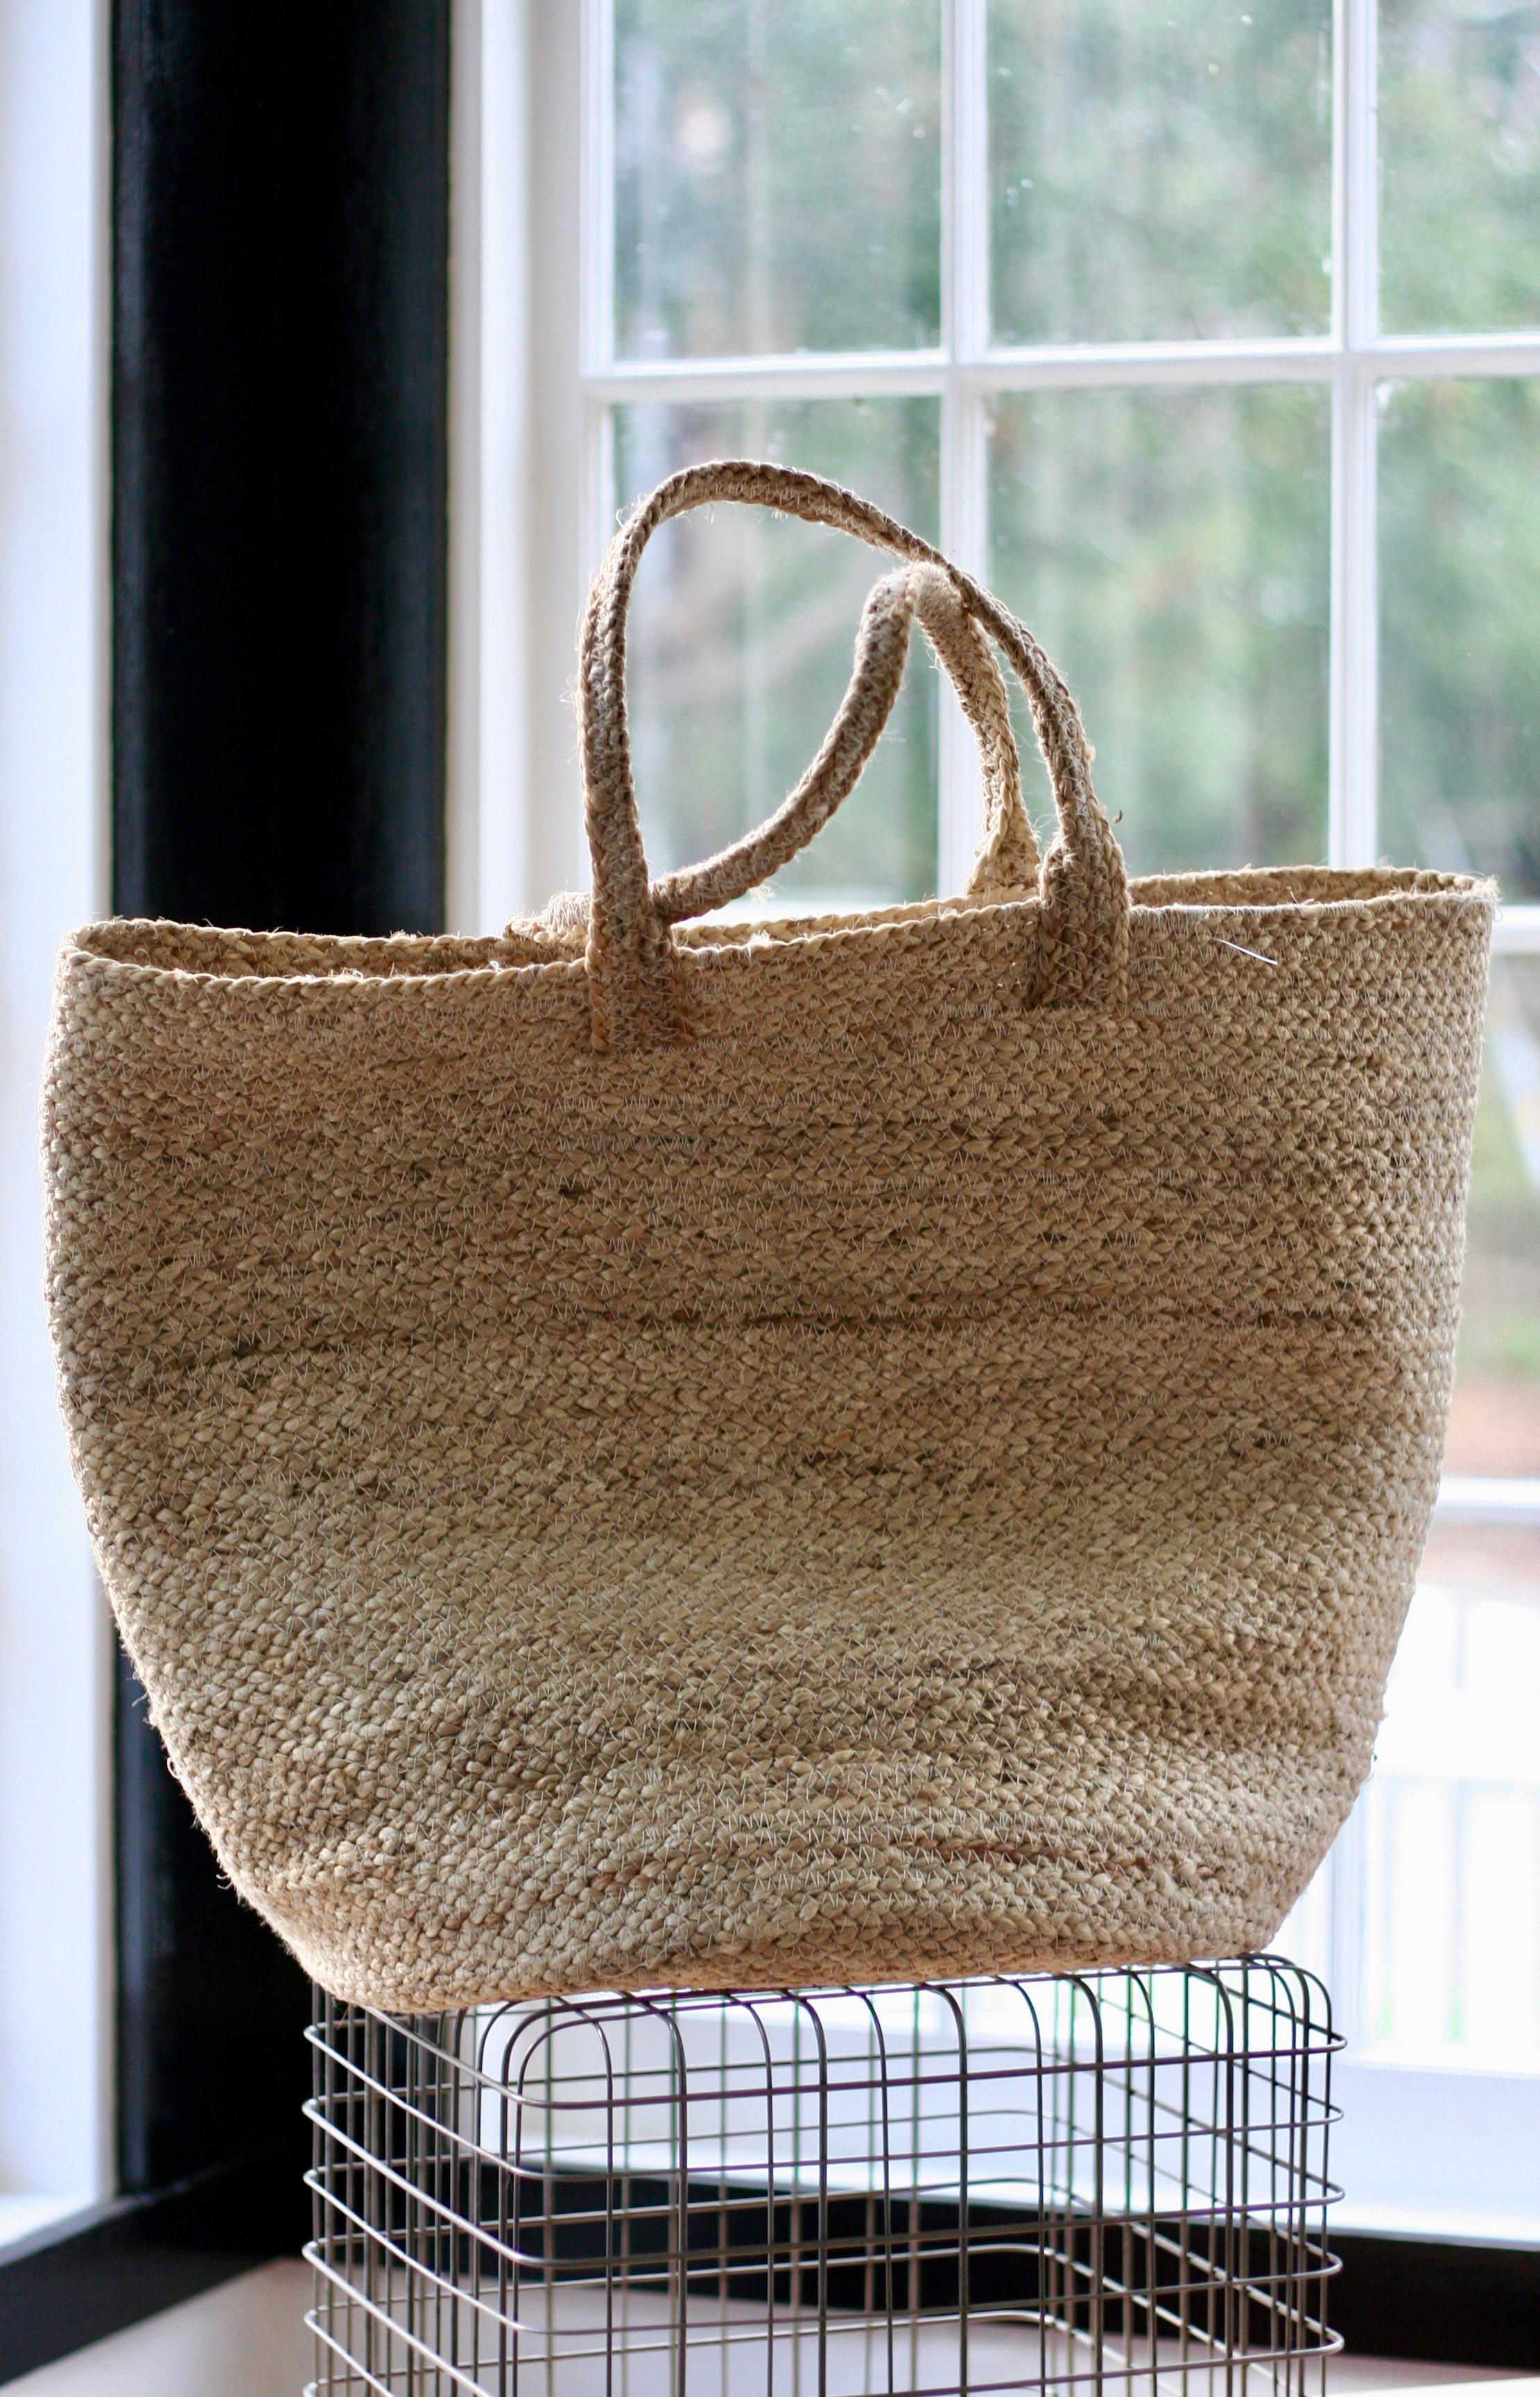 Handmade jute farmers market bag.jpeg